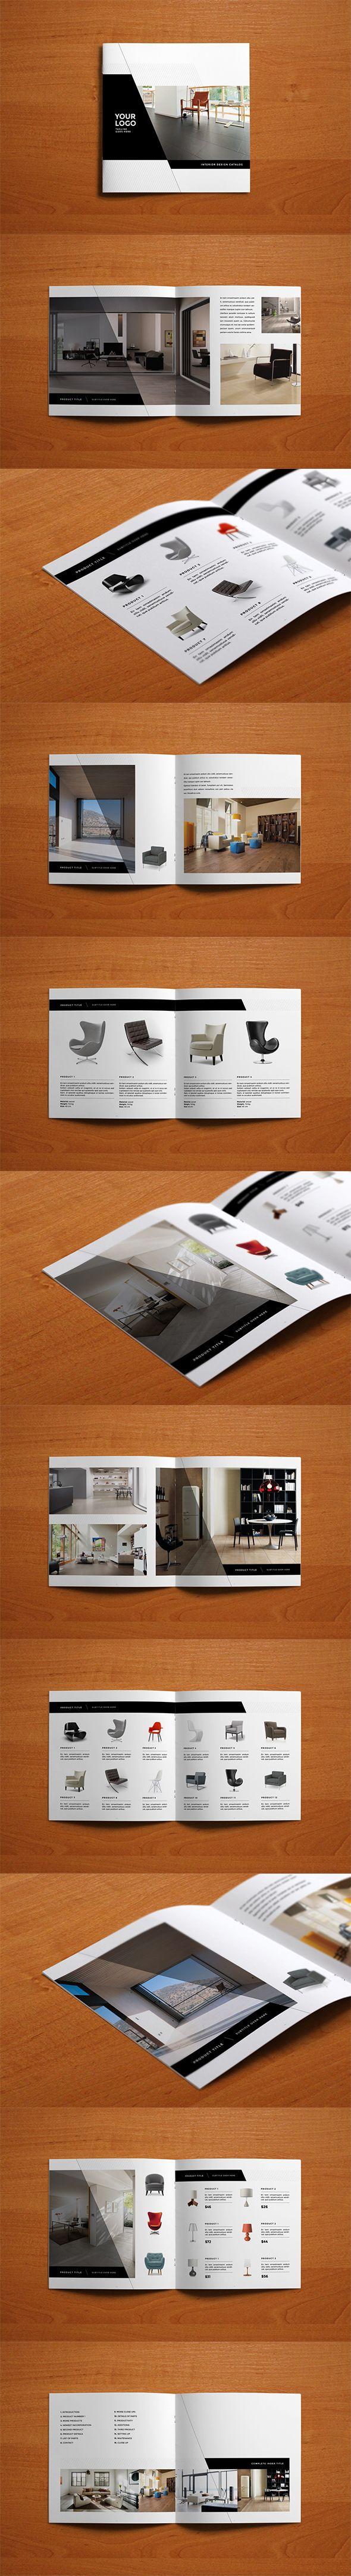 Minimal Interior Design Catalog. Download here: http://graphicriver.net/item/minimal-interior-design-catalog/9849569?ref=abradesign #design #brochure #catalog